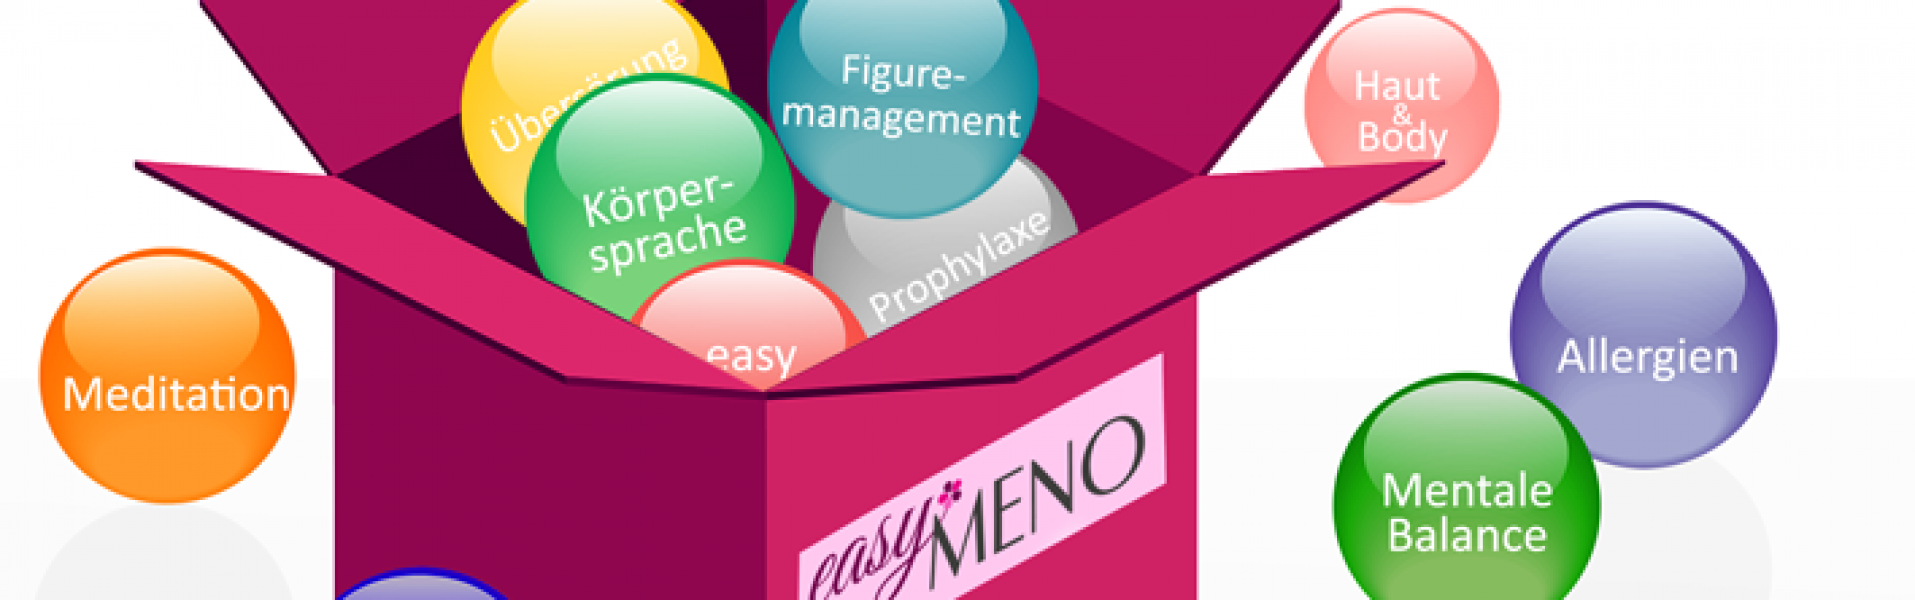 EasyMeno-Box-web_small